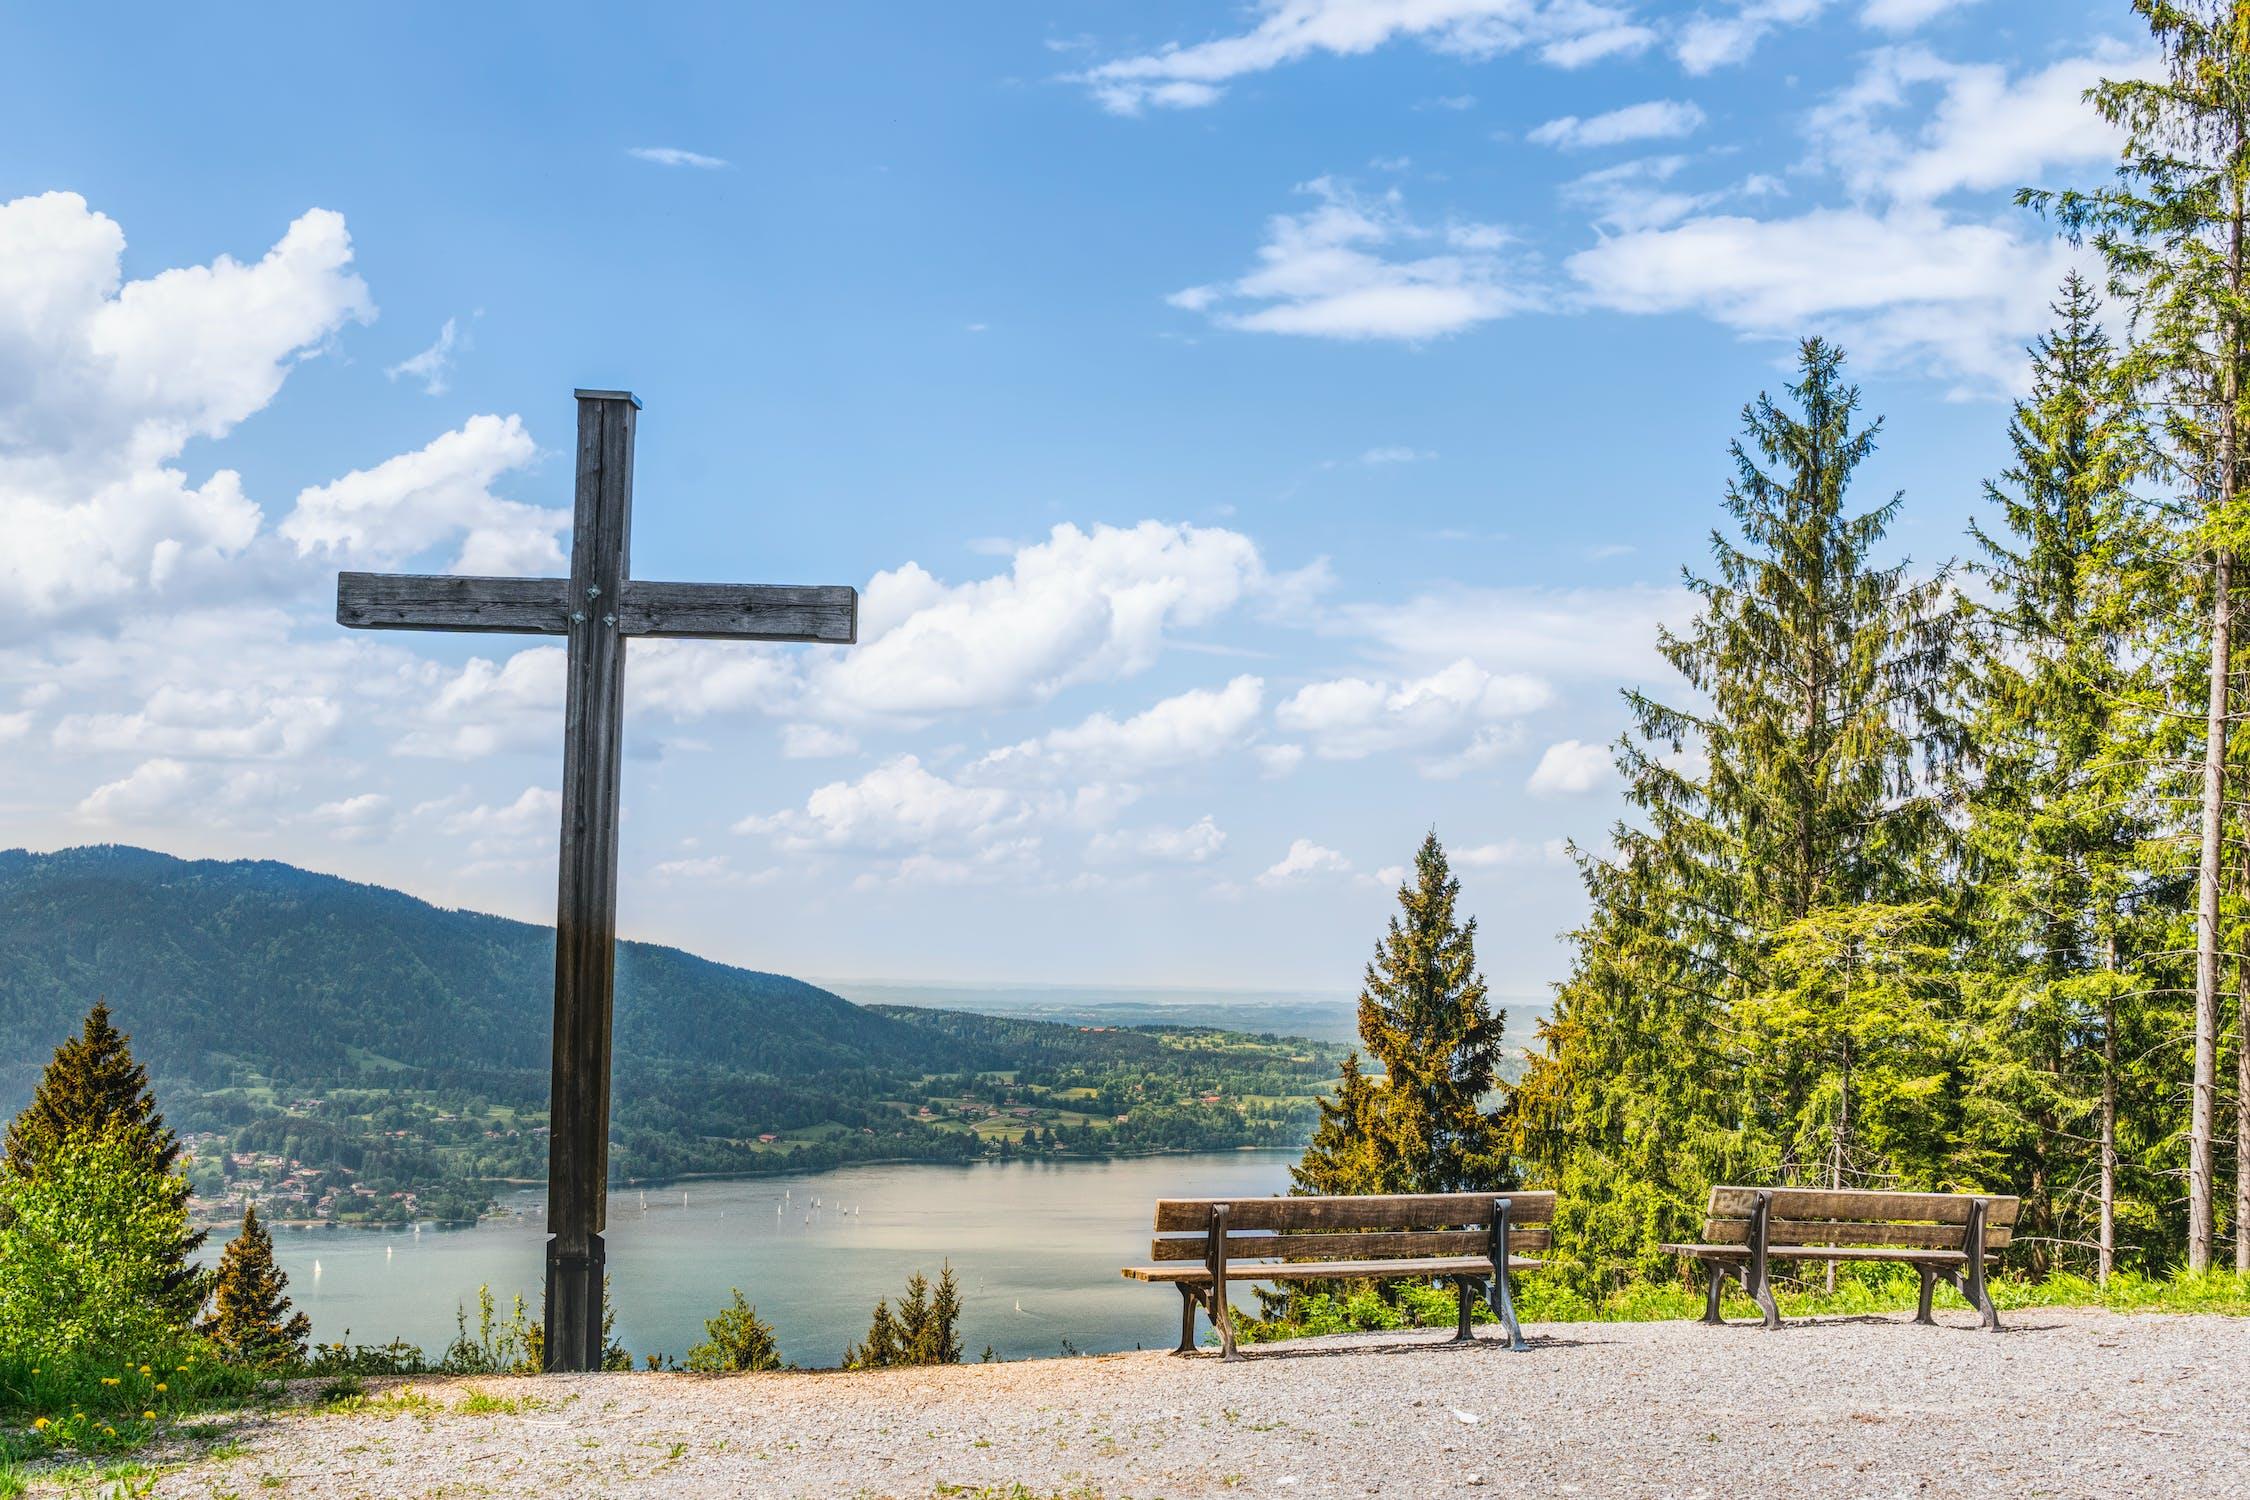 Green New Deal Picks Up Important Christian Endorsements